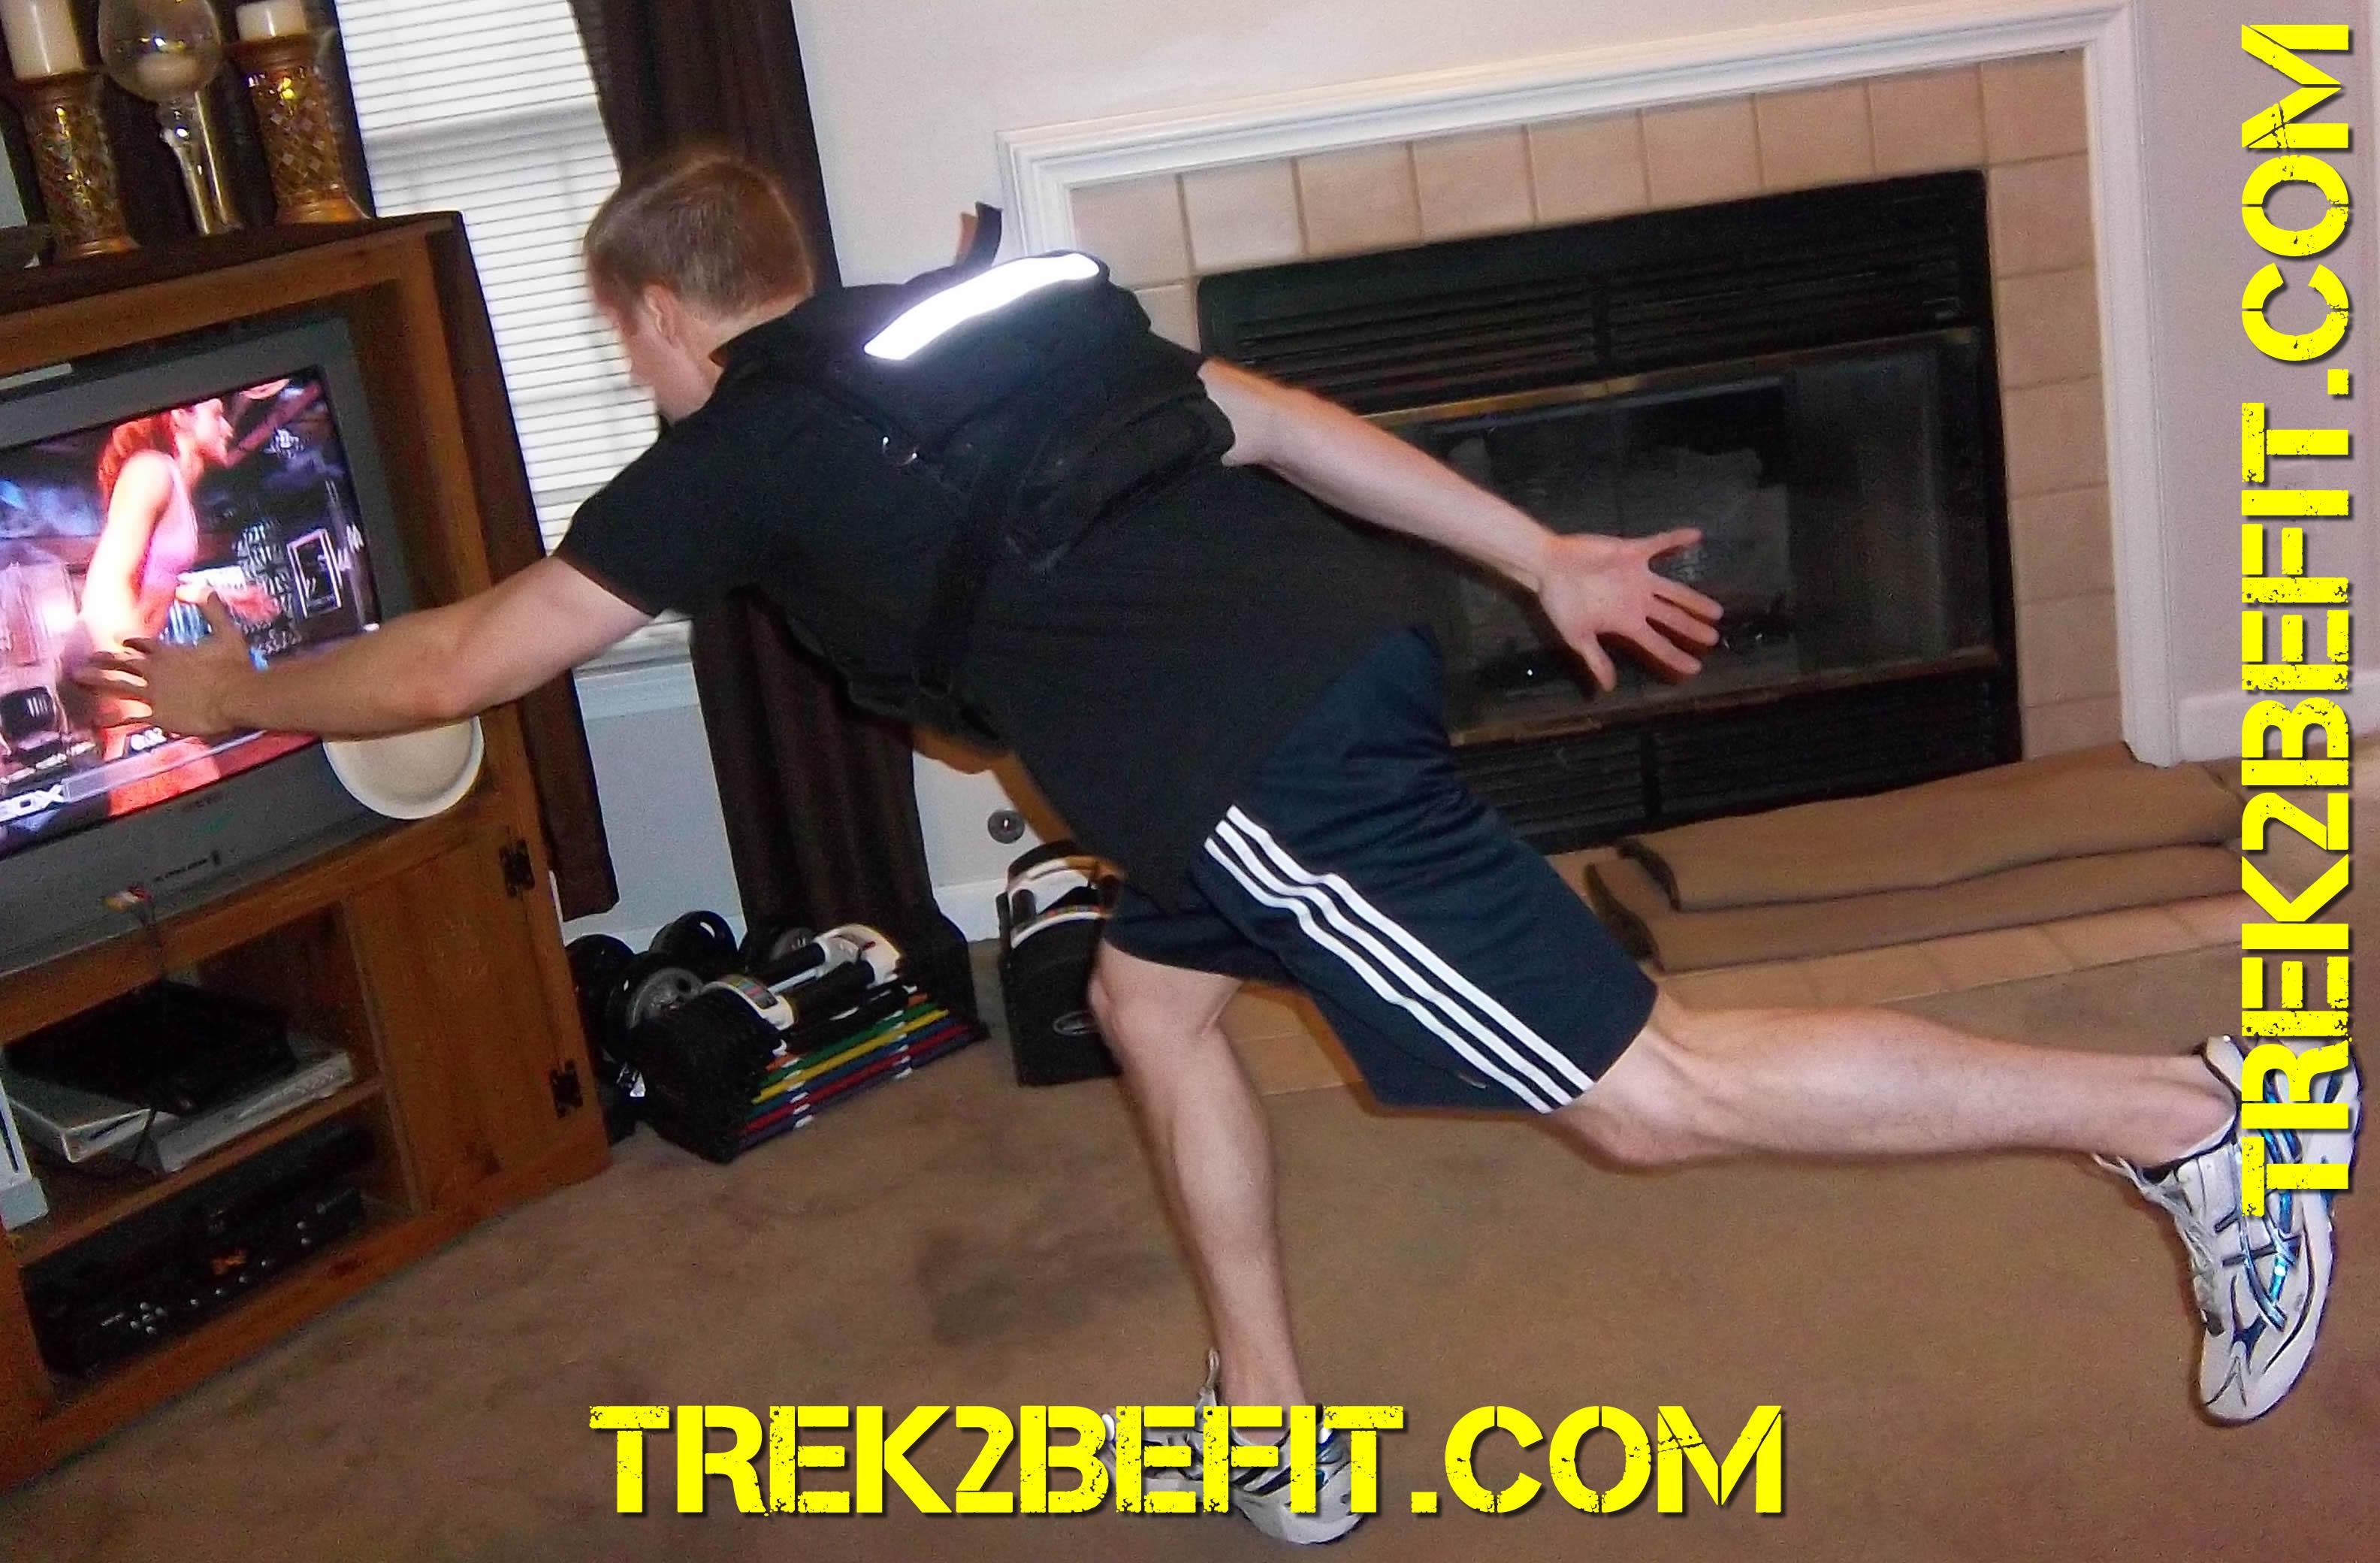 P90x Legs And Back Trek2befit